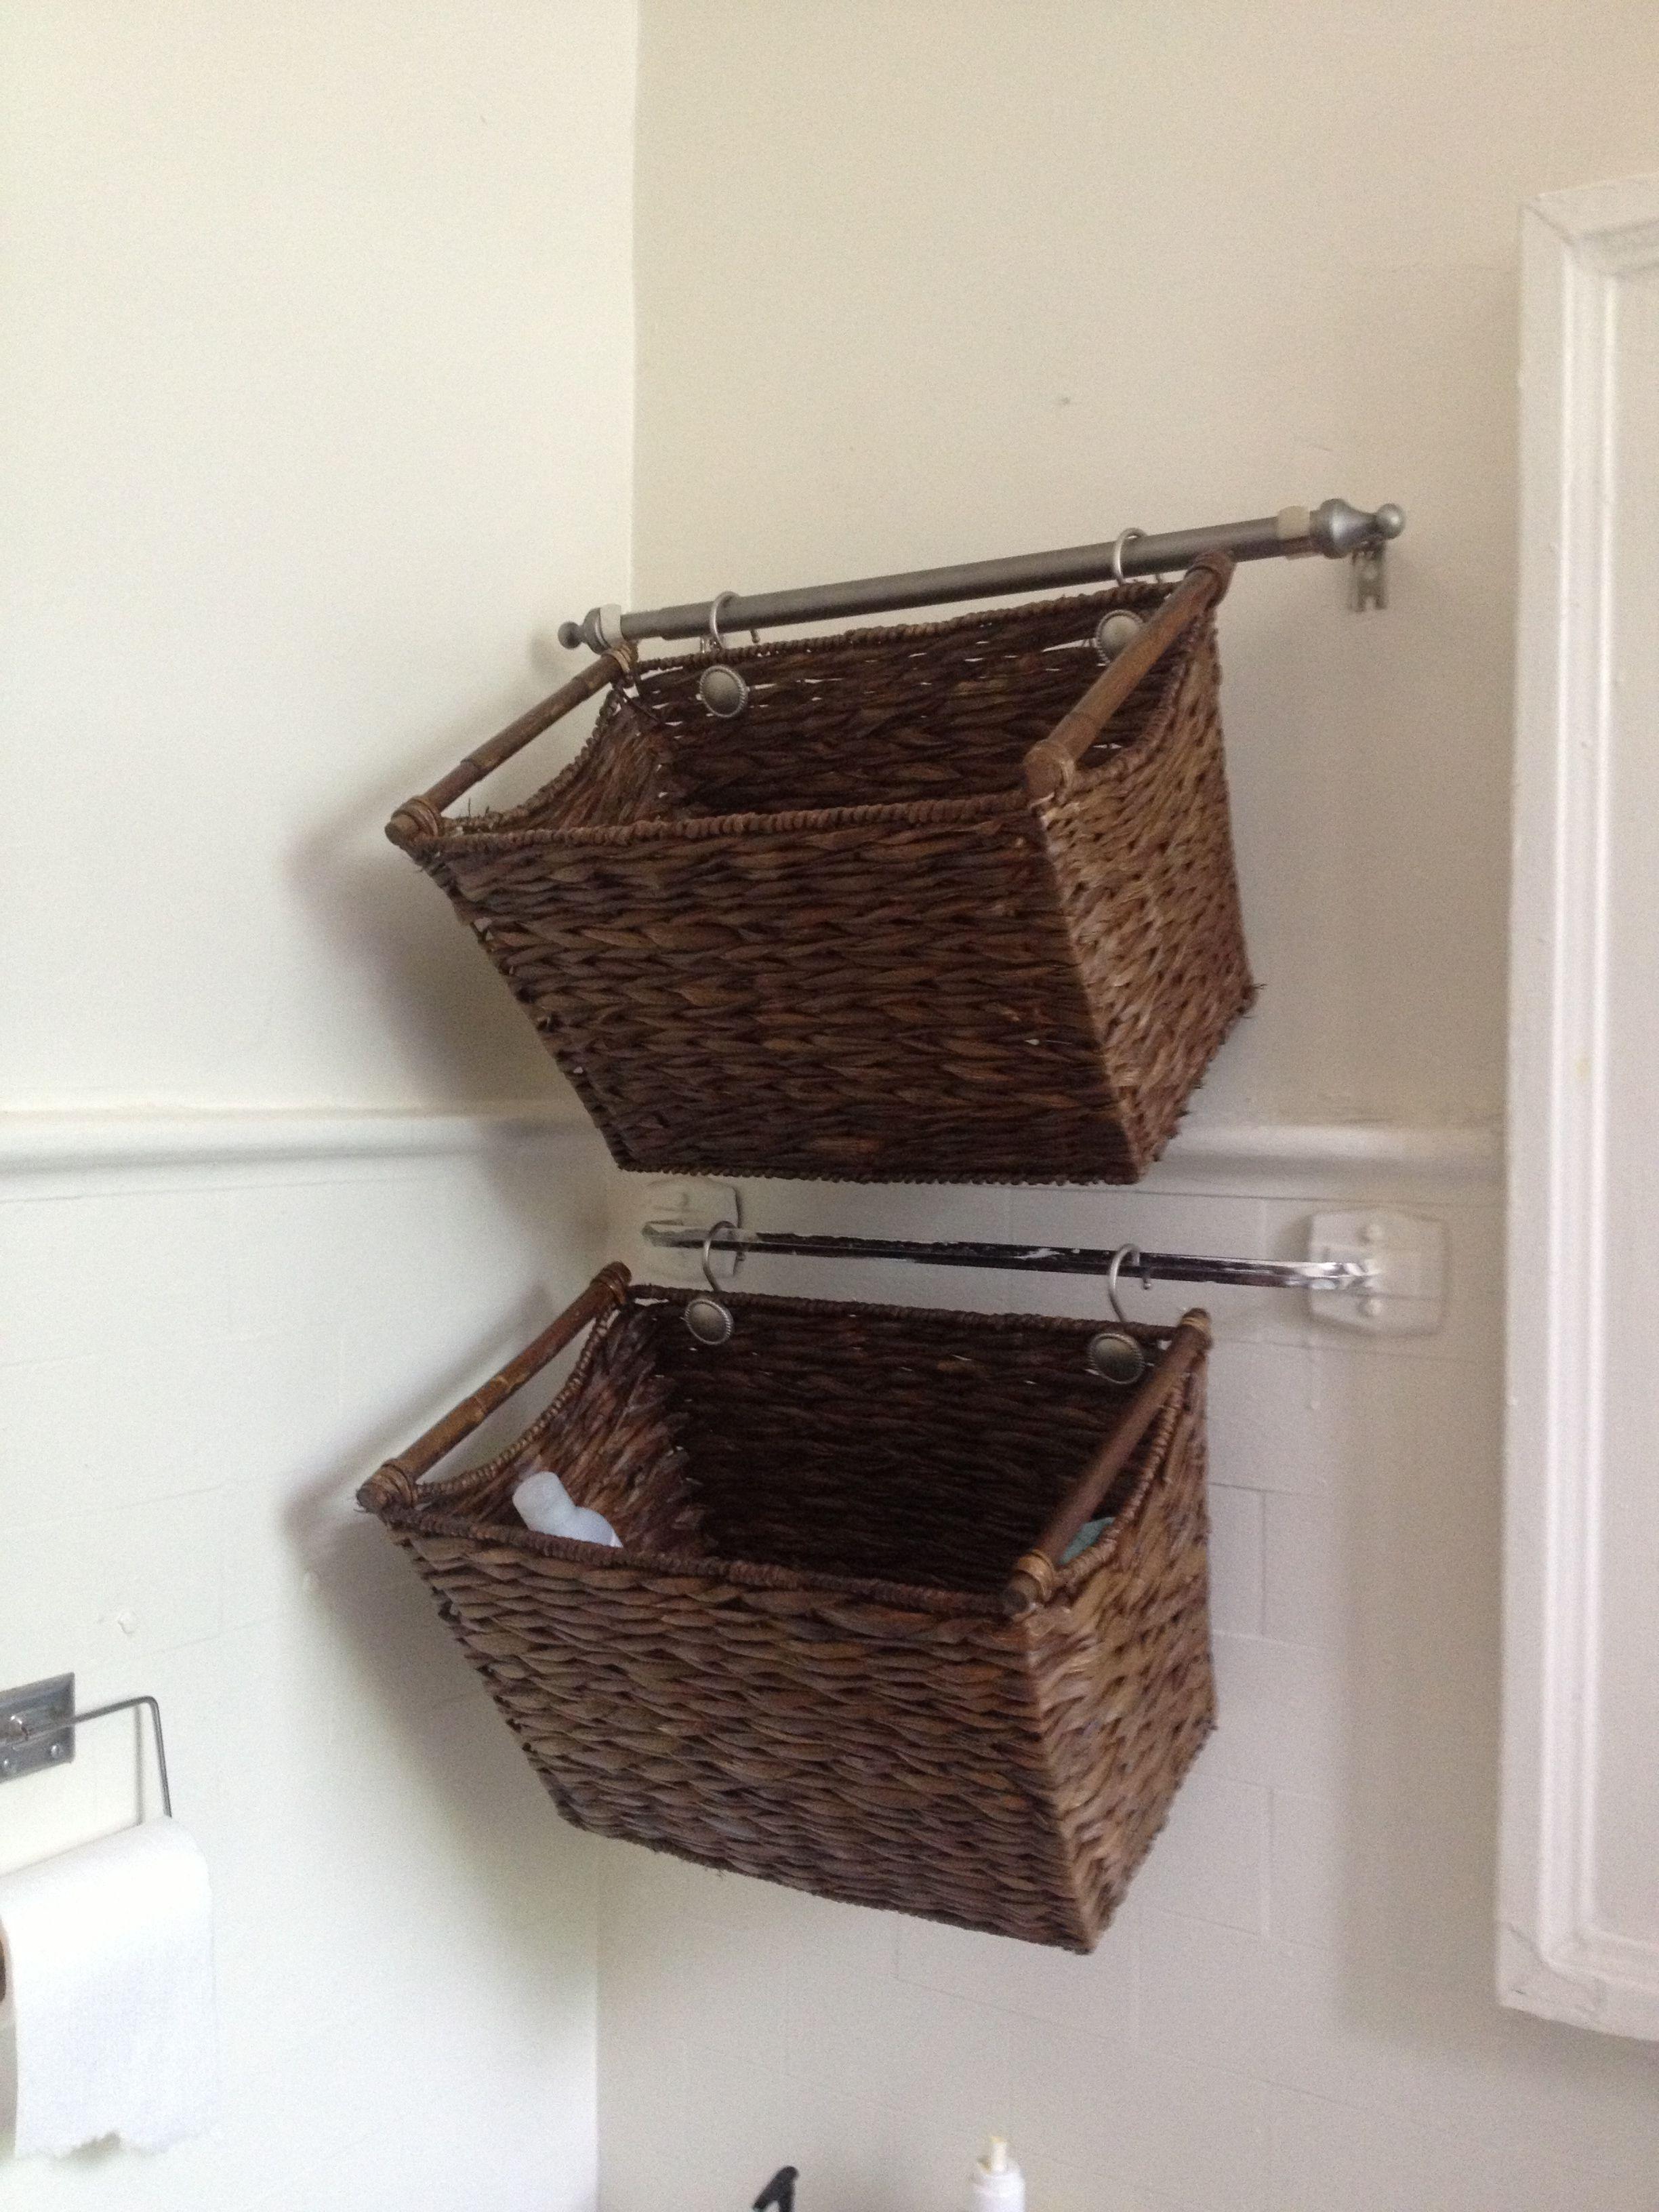 51 Amazing Small Bathroom Storage Ideas For 2018 Best regarding size 2448 X 3264